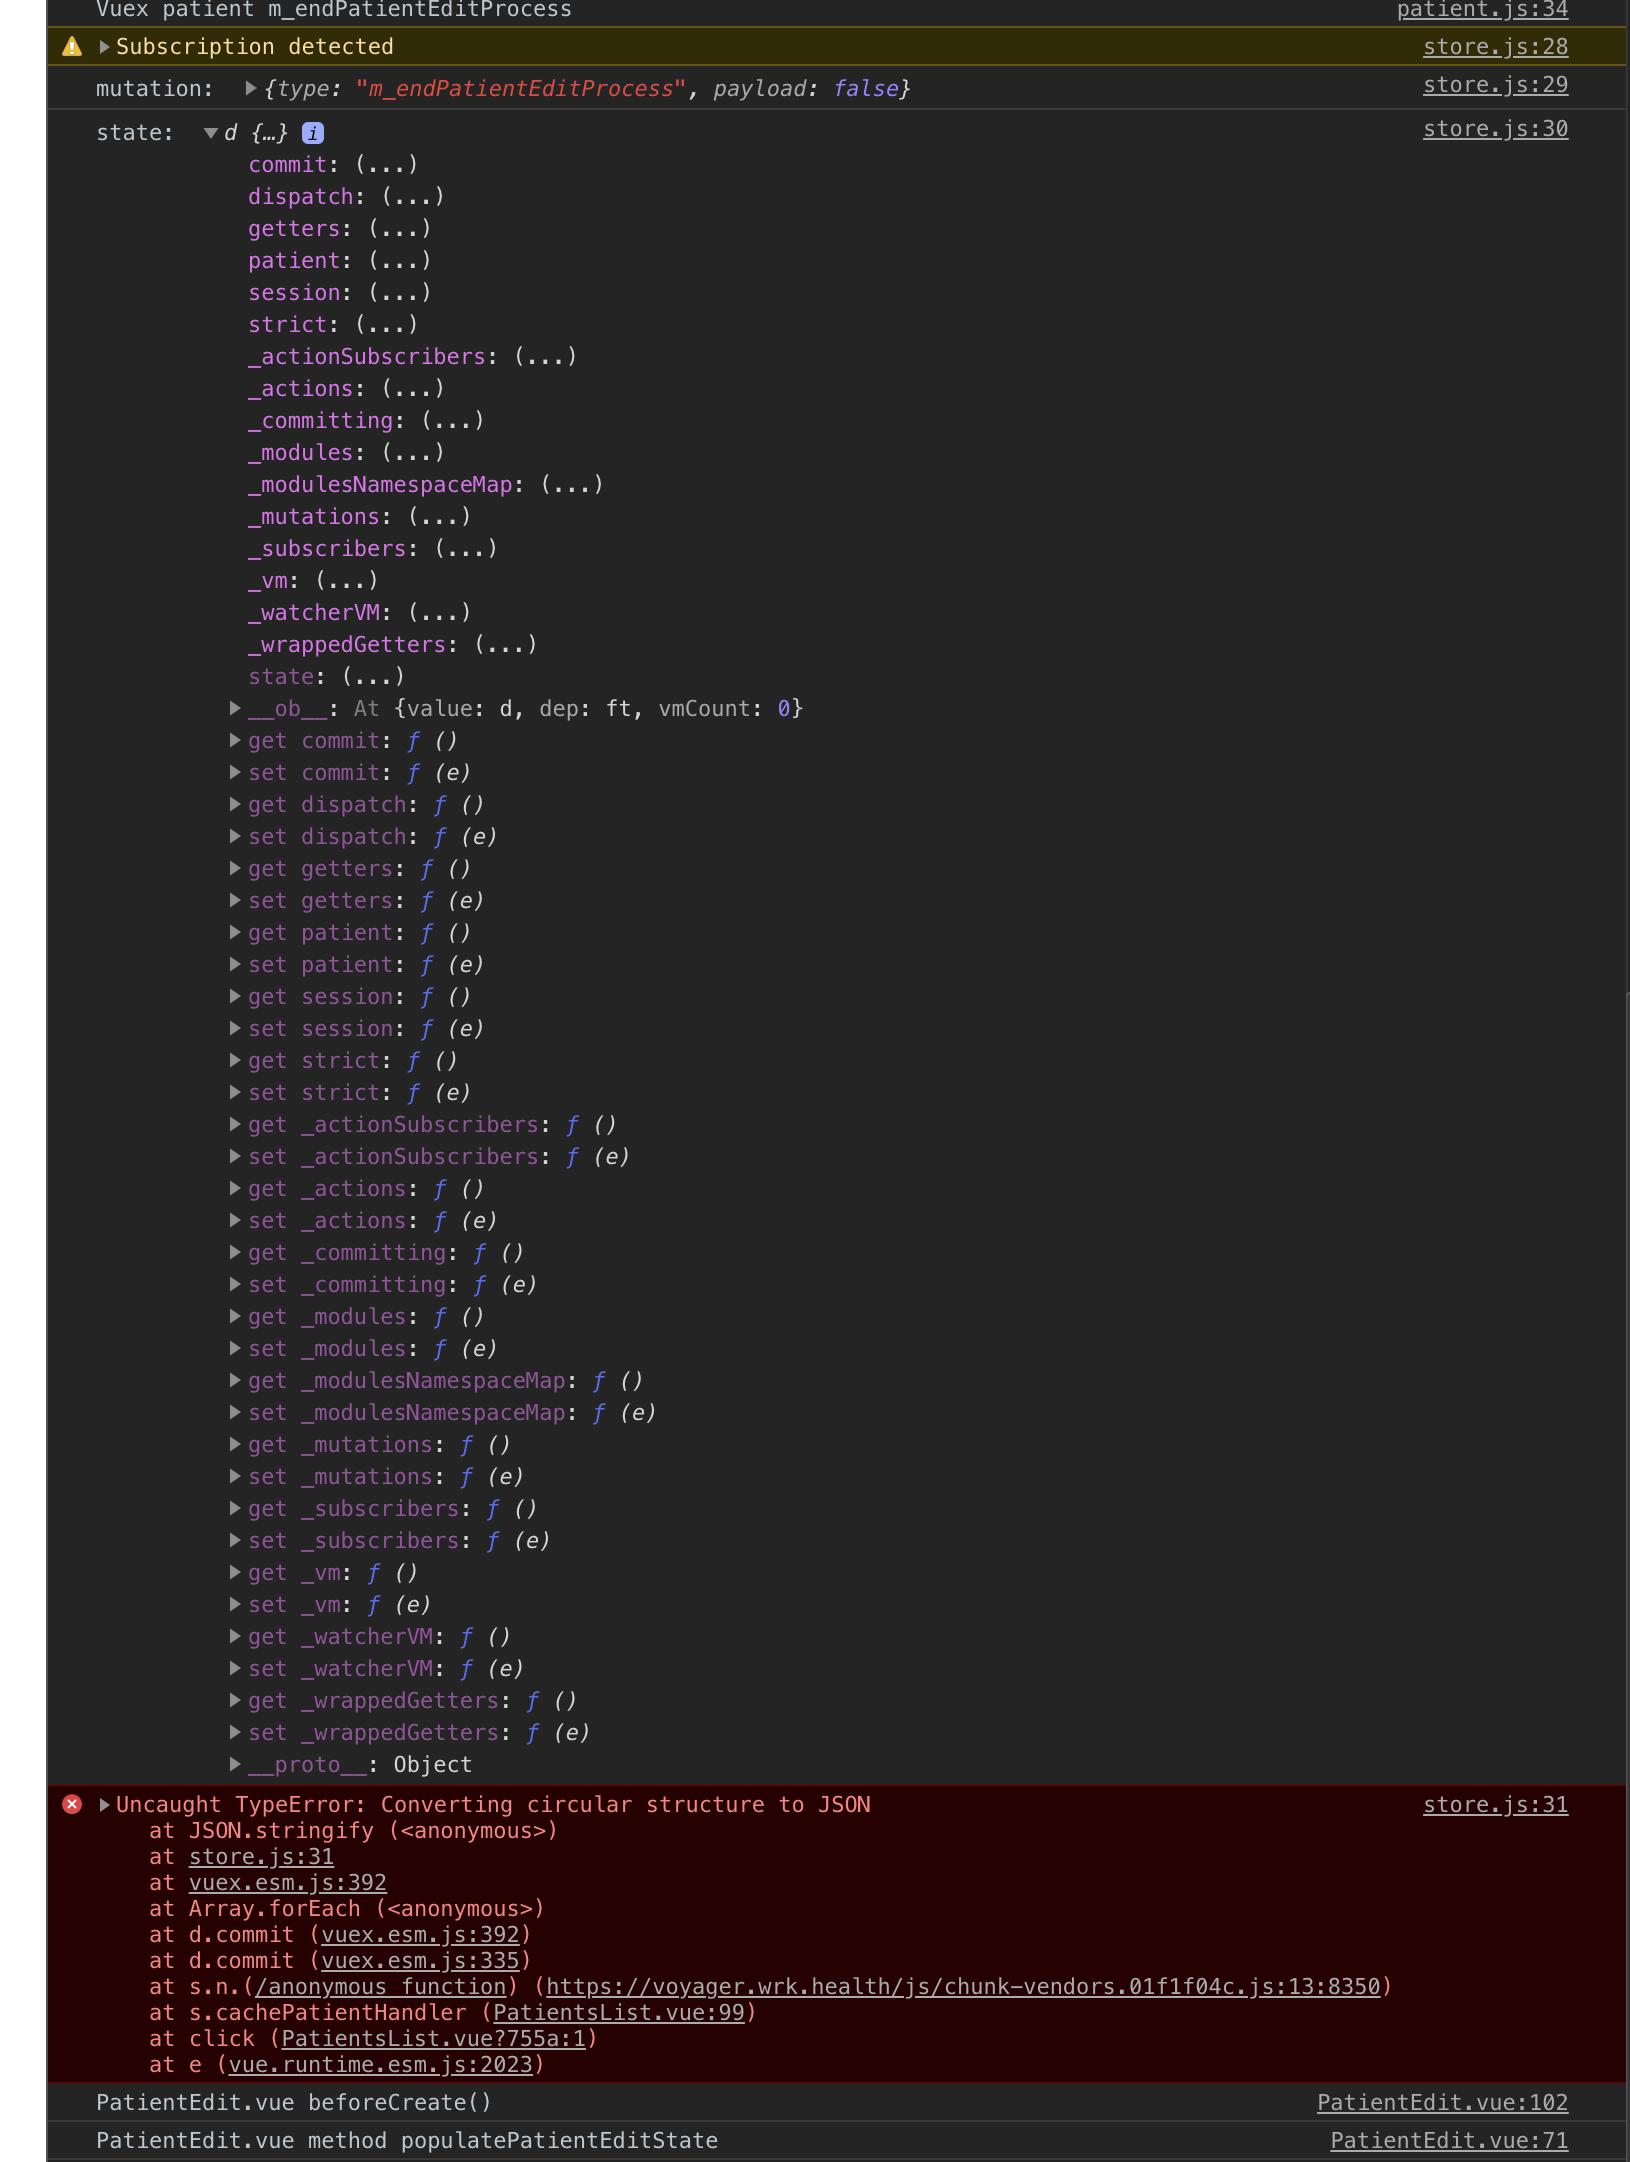 Baffling mutation payload in new window/tab - Get Help - Vue